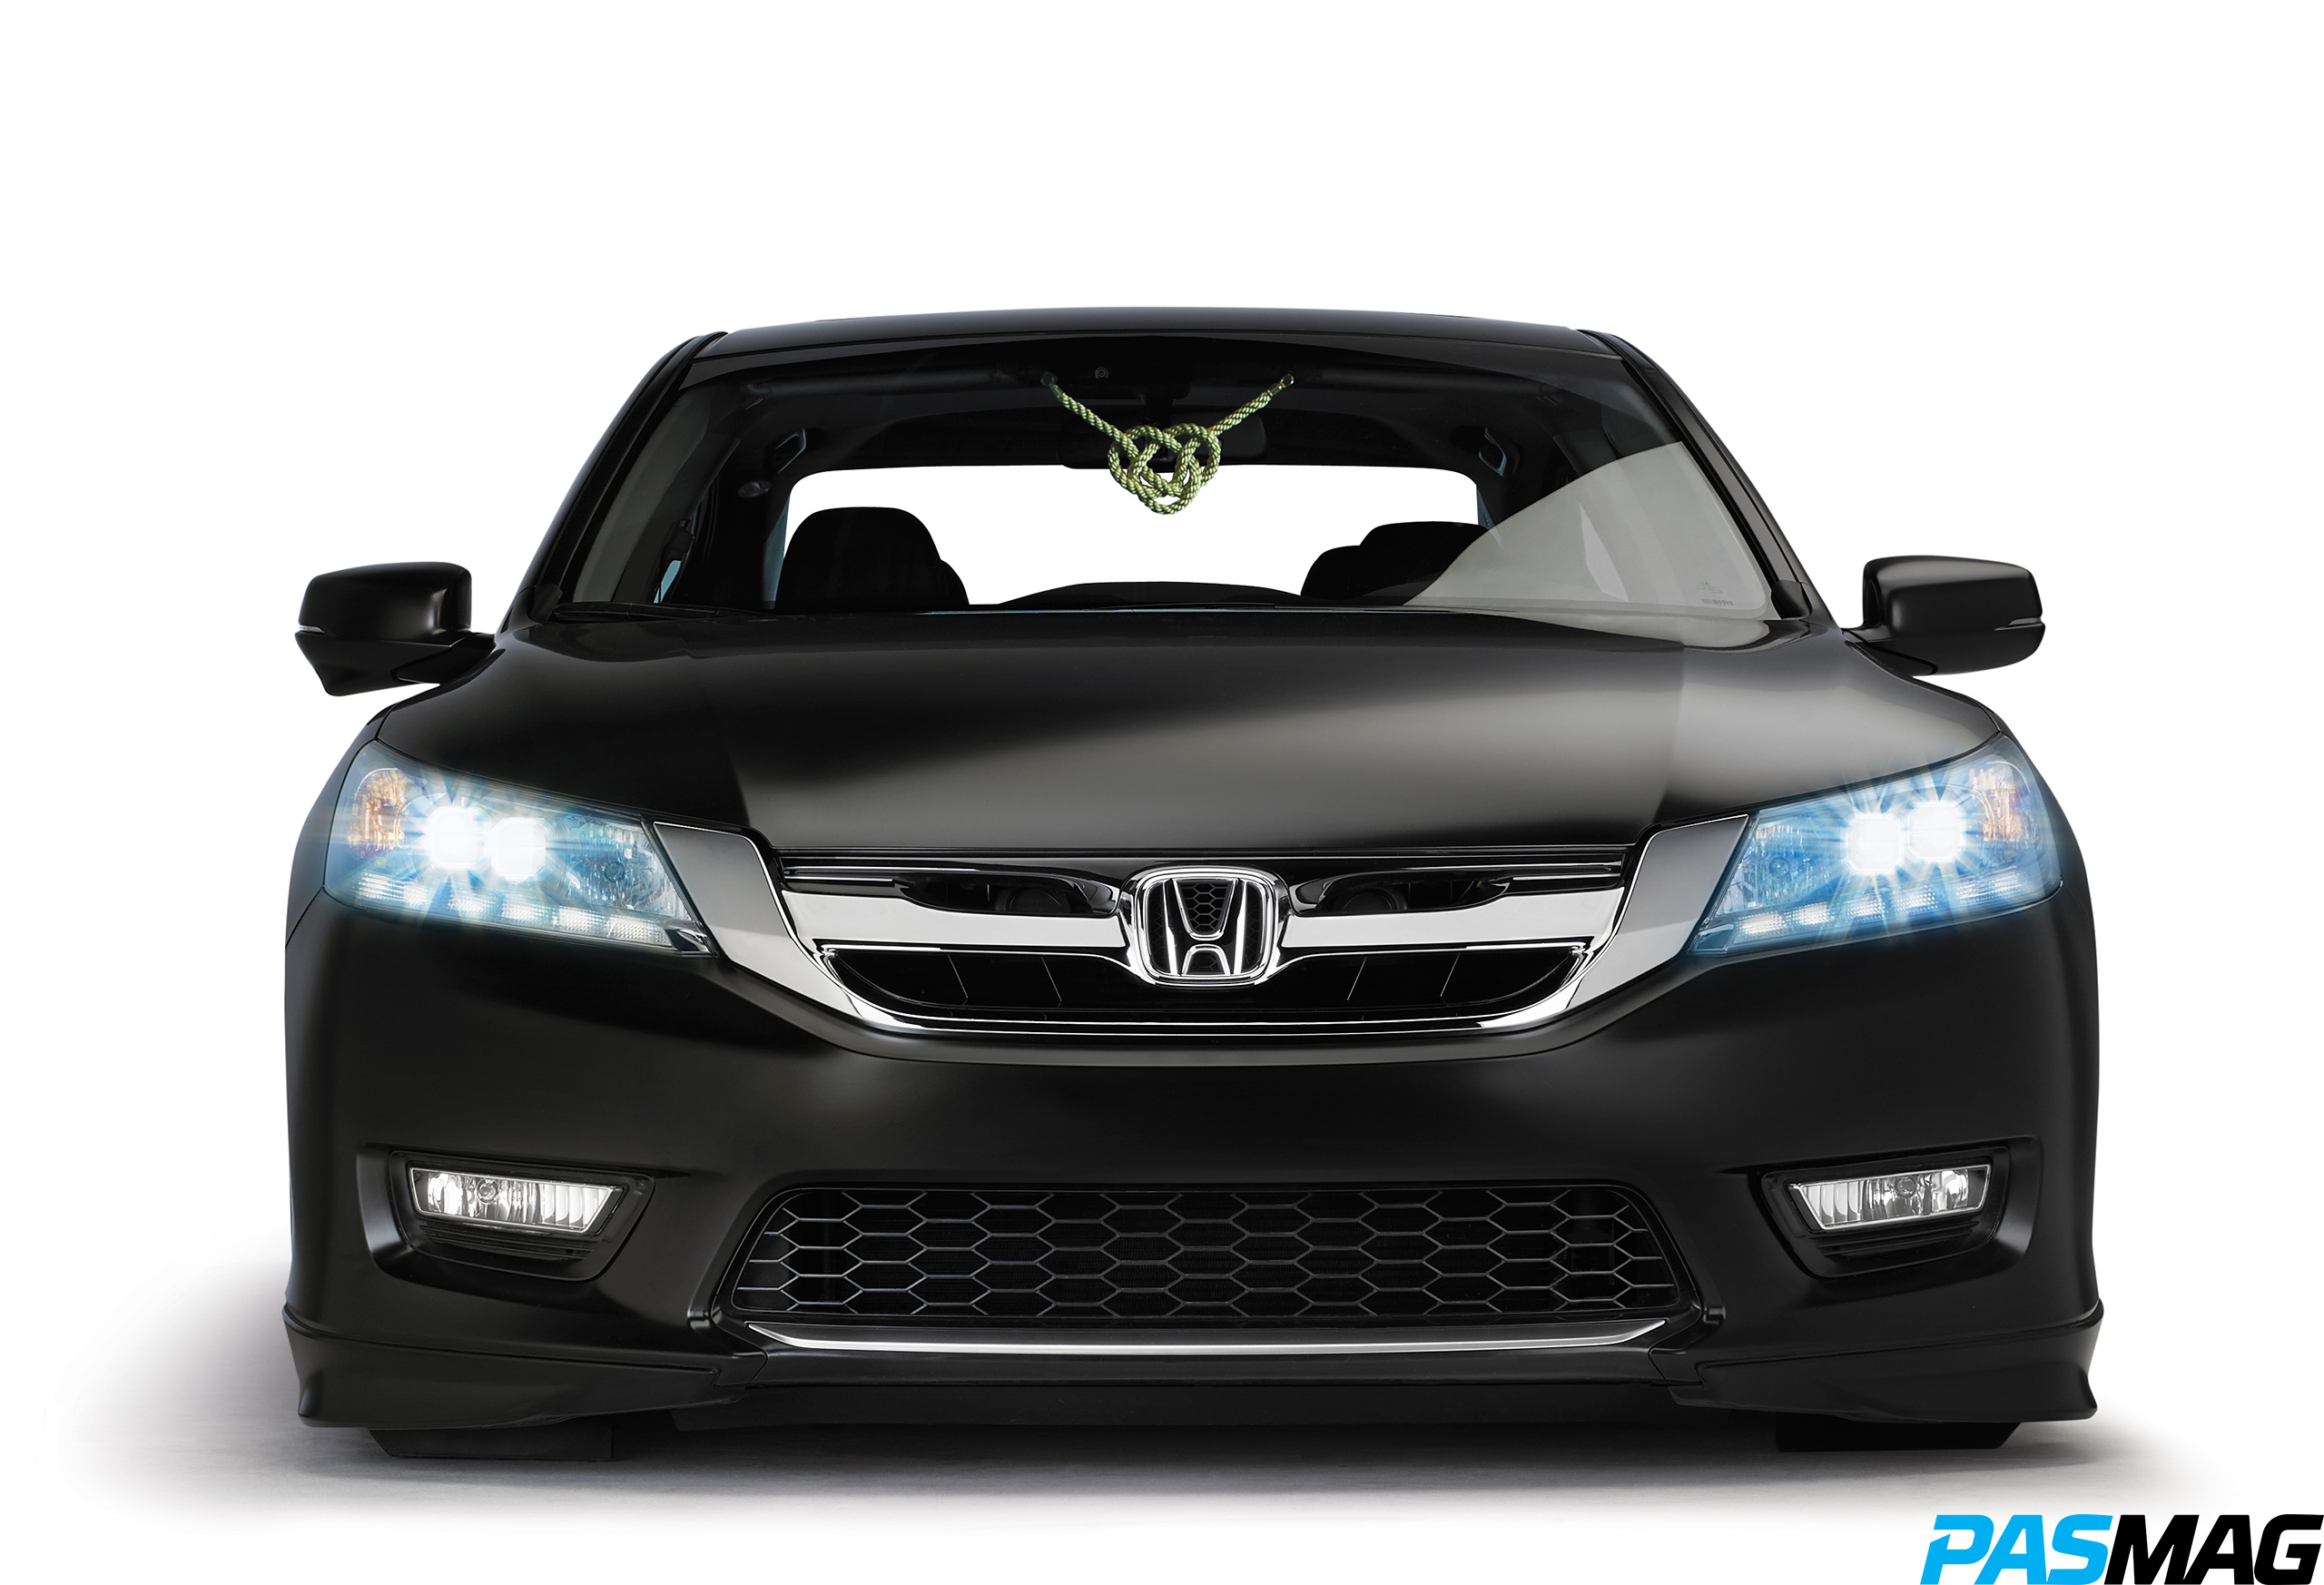 coupe wallpaper cars front h images of hd ex accord honda sedan l